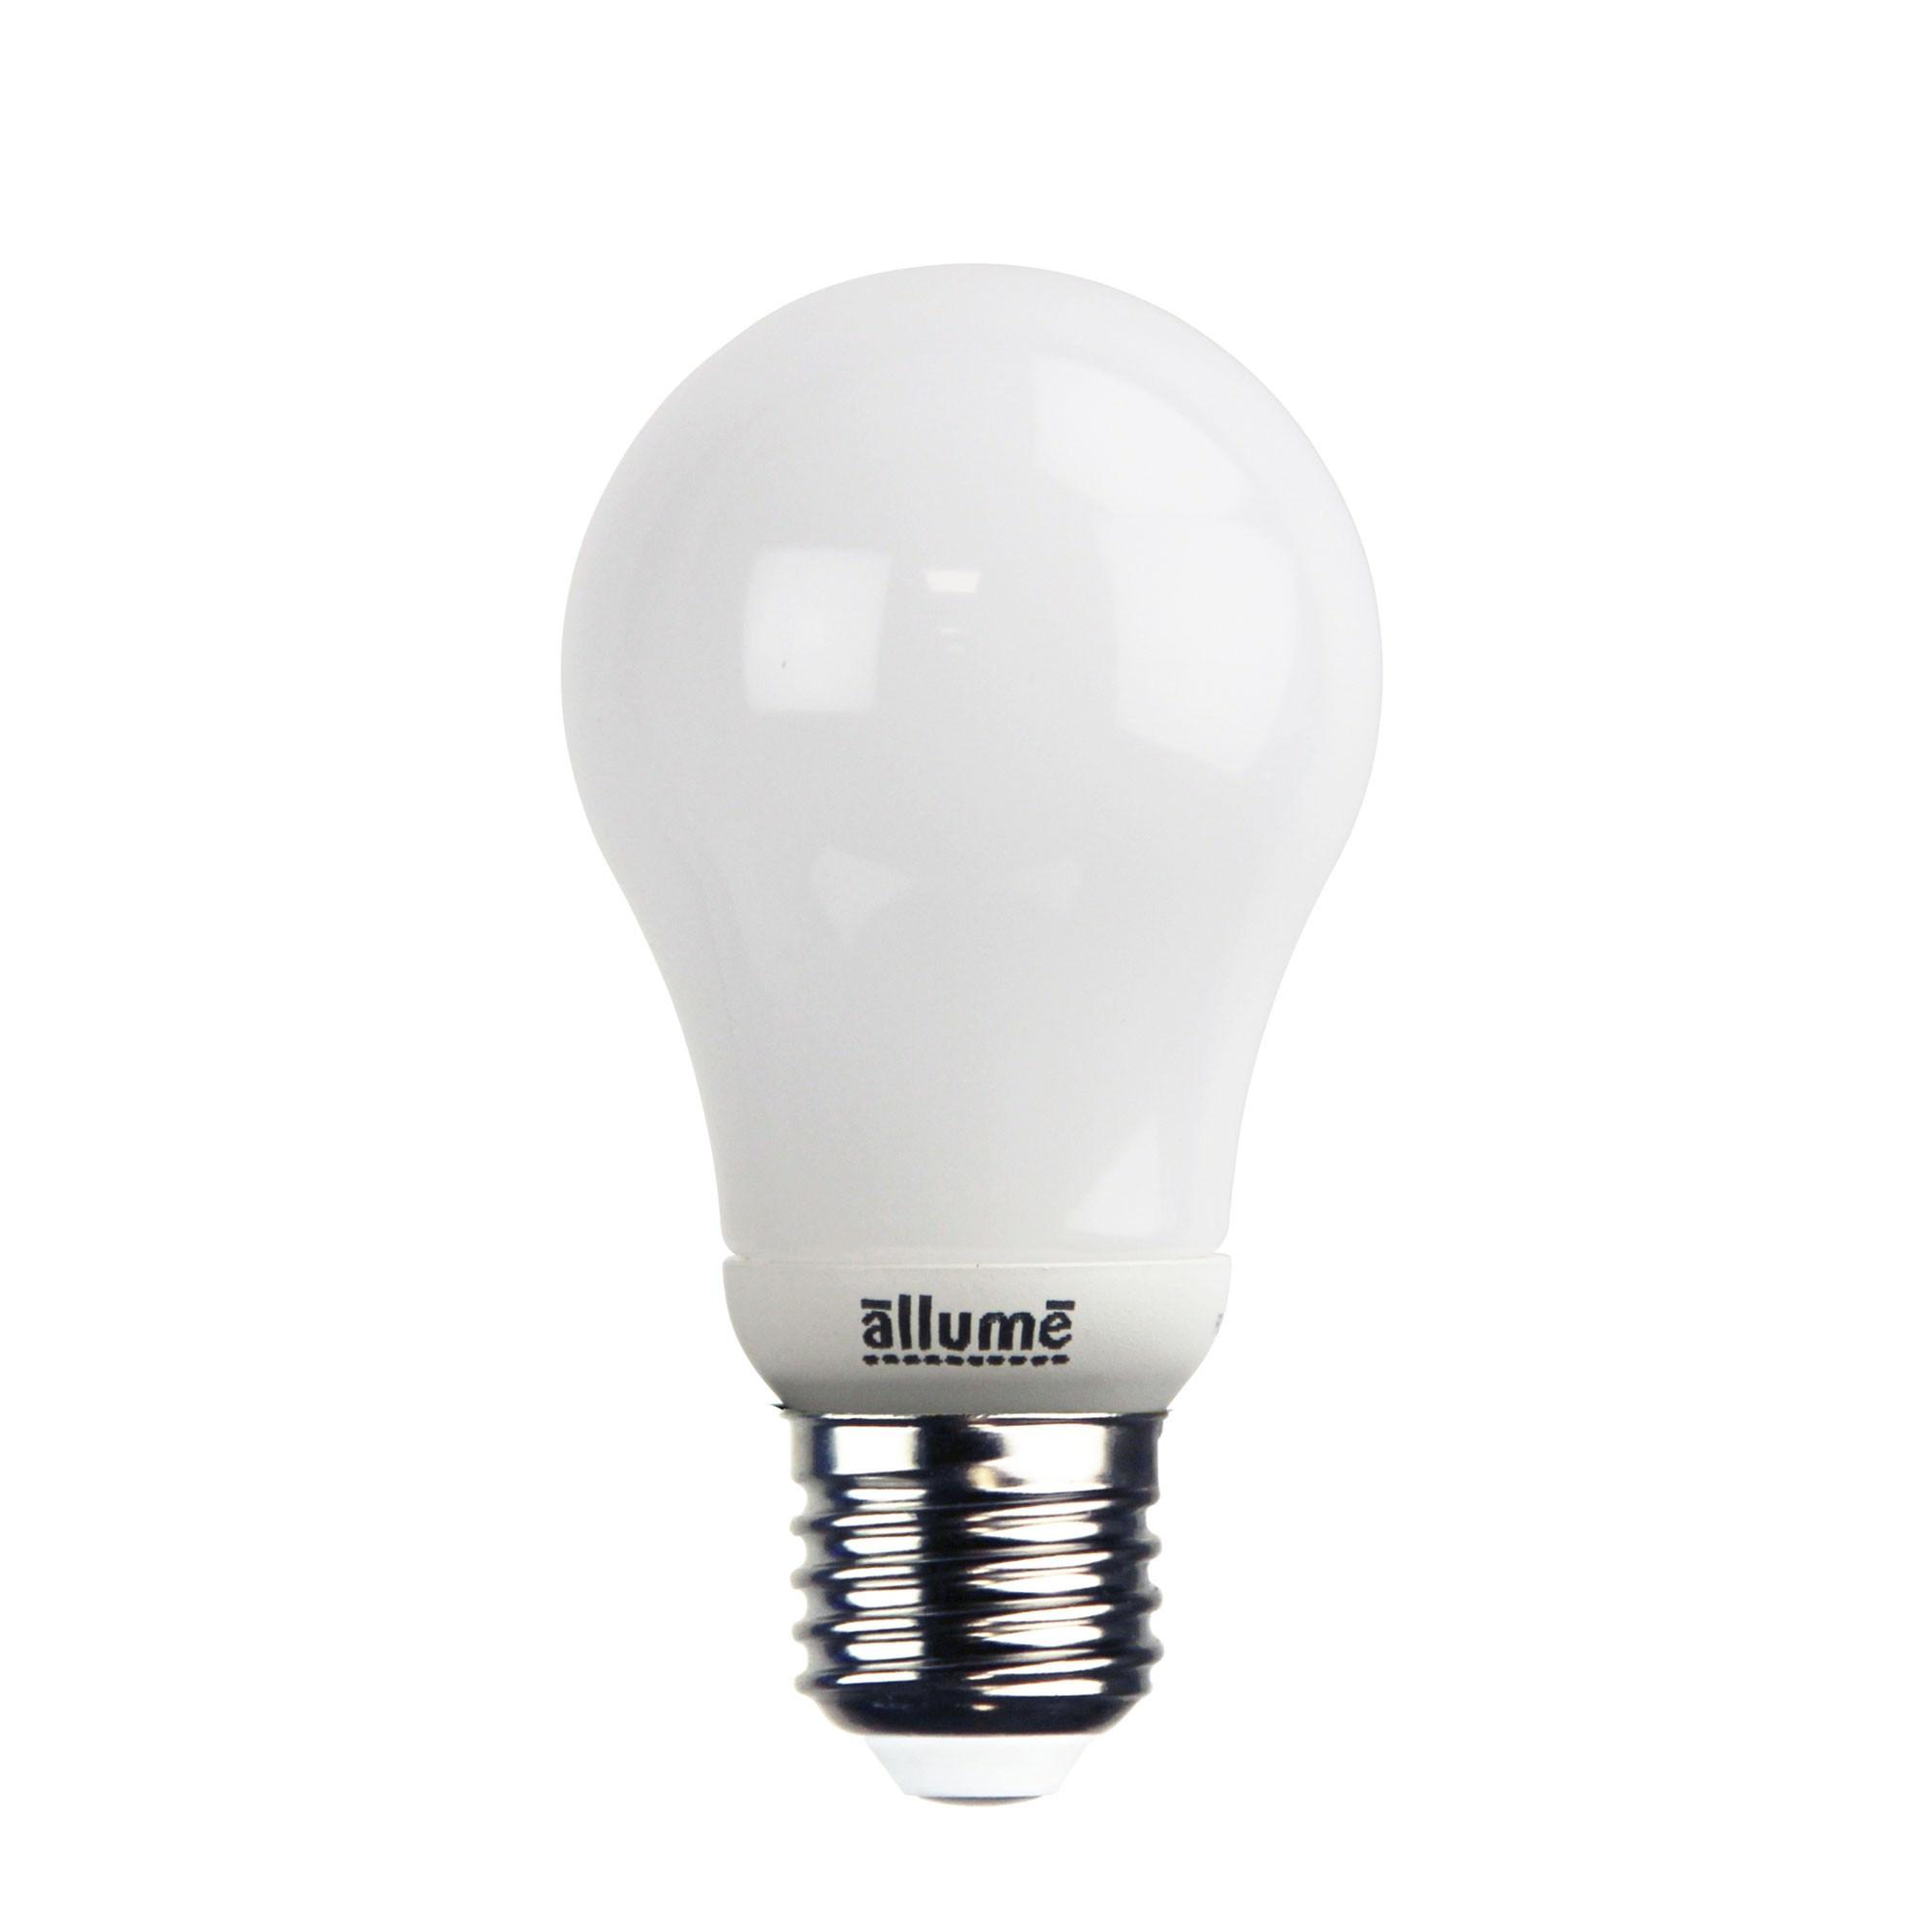 Allume LED Globe, 8W, E27, 4000K, GLS Shape